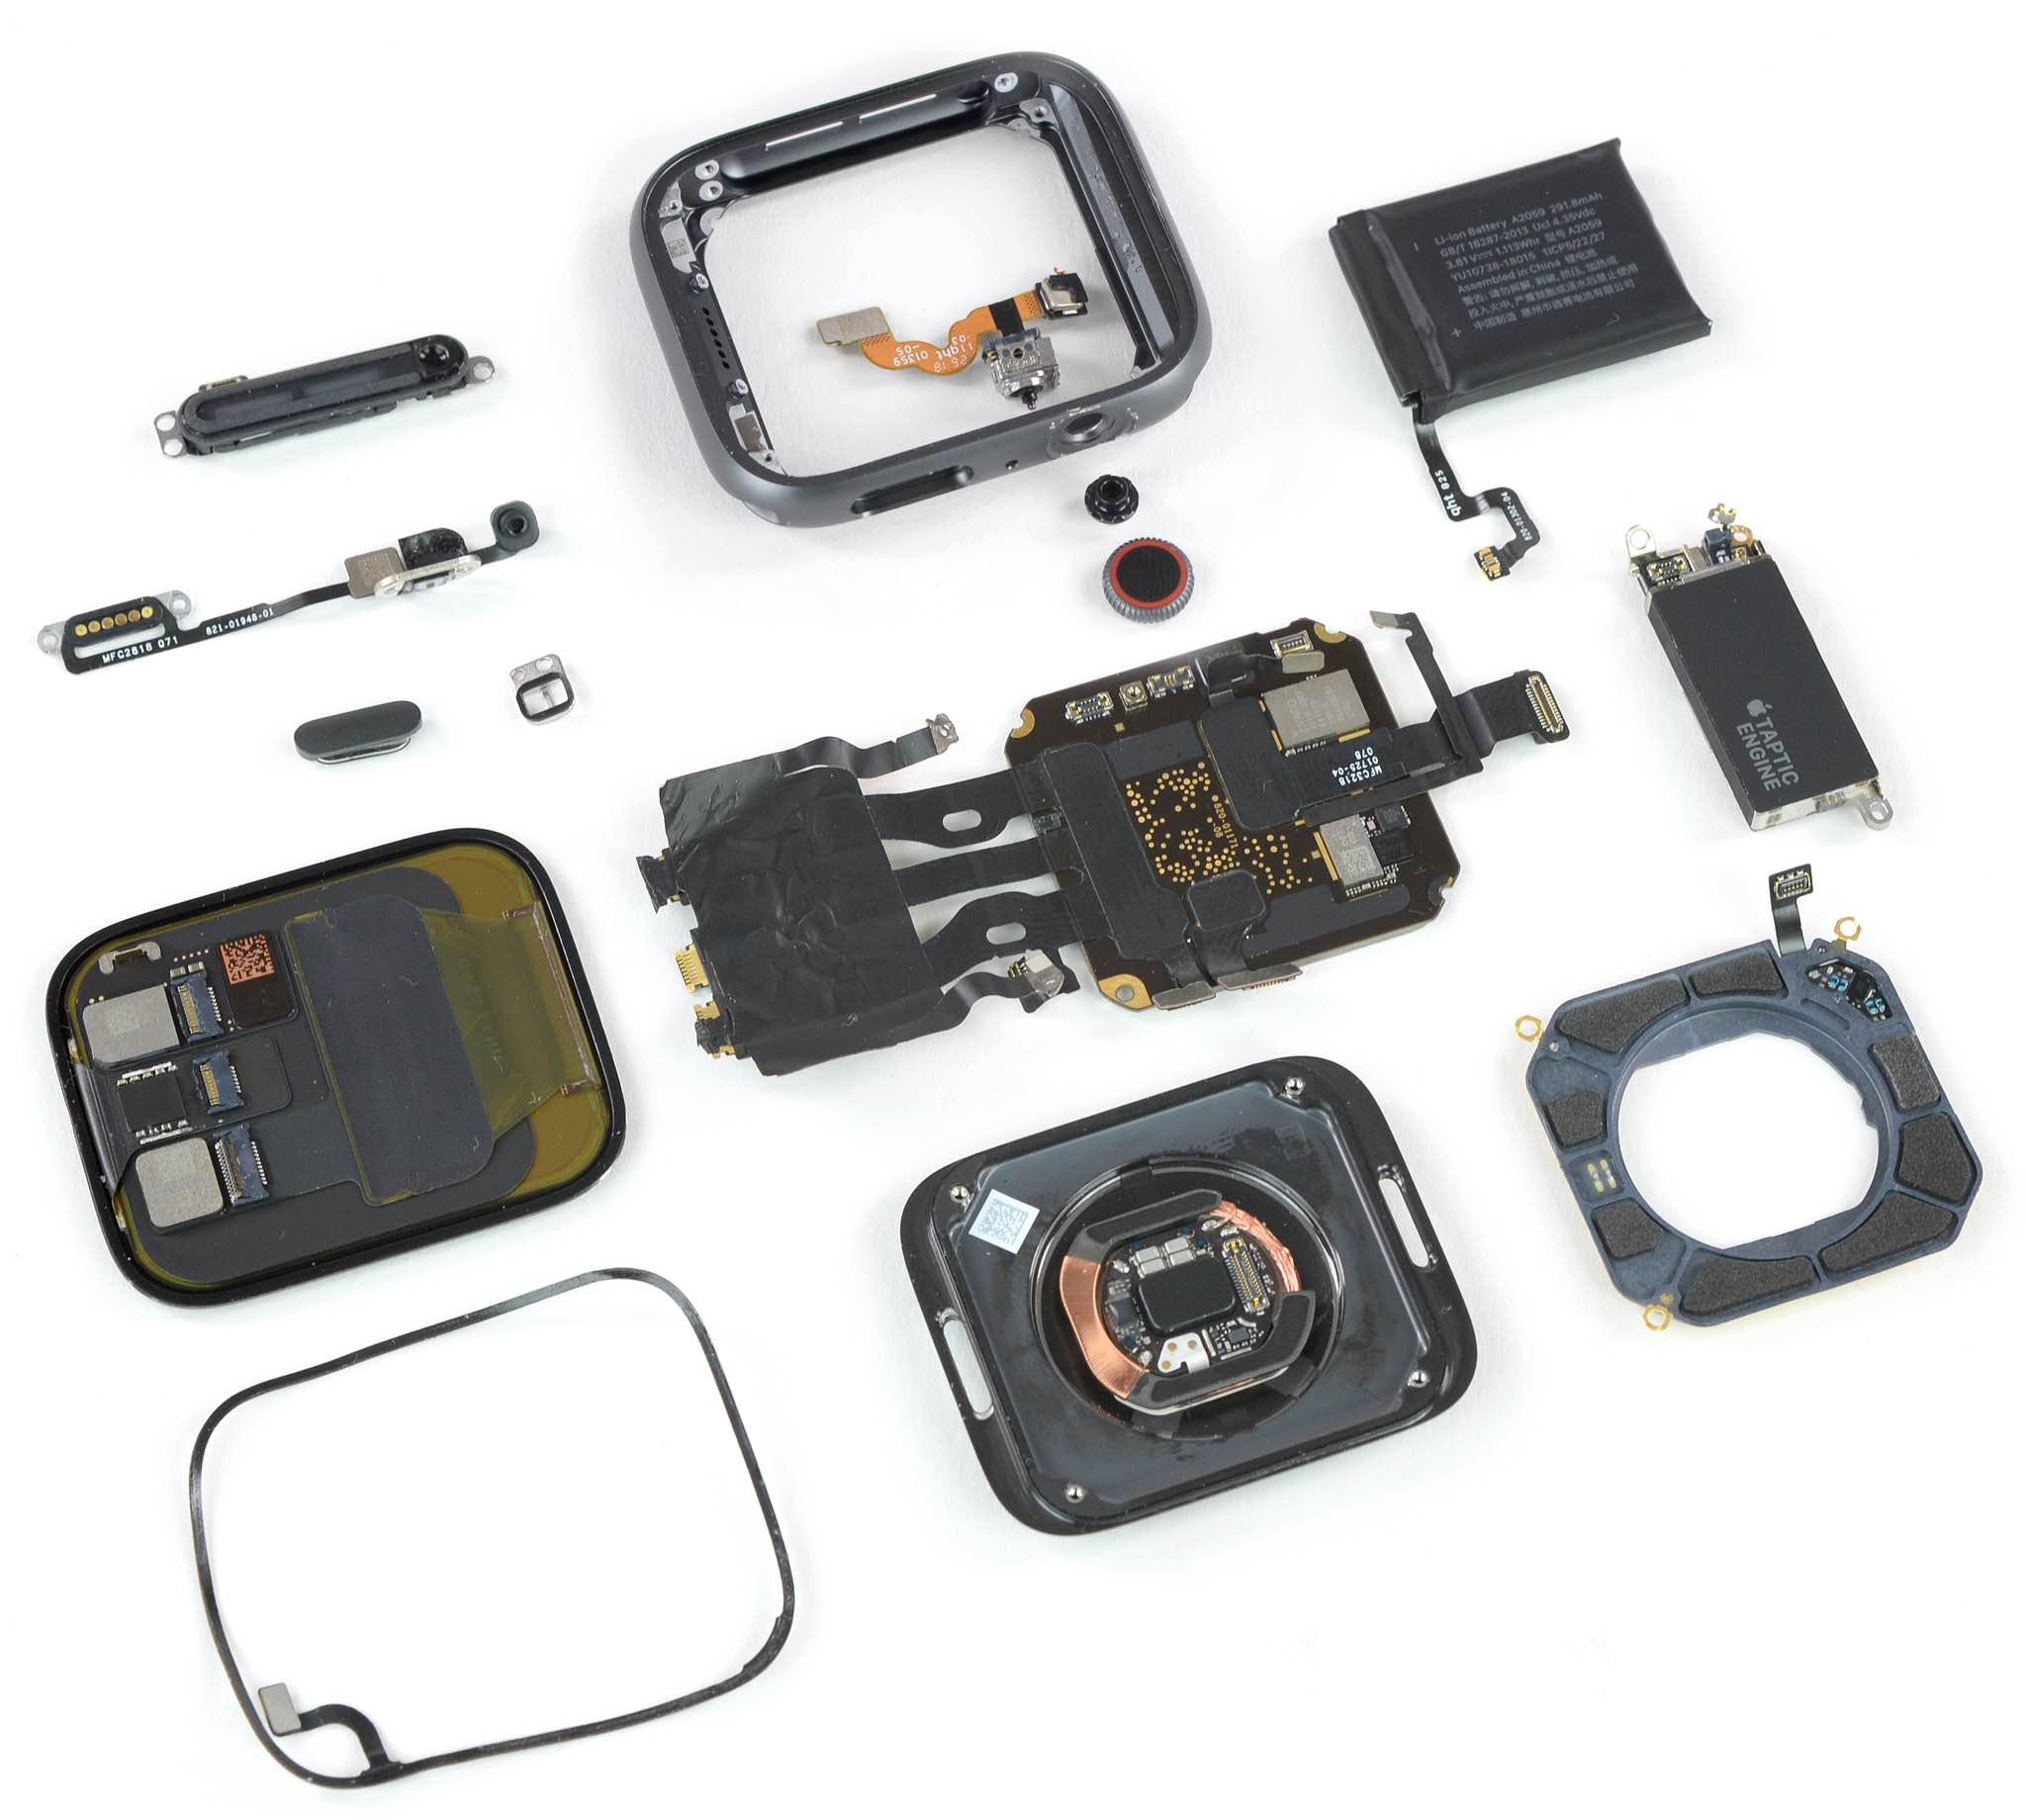 Apple Watch Series 4teardown reveals major improvements in terms of the internals